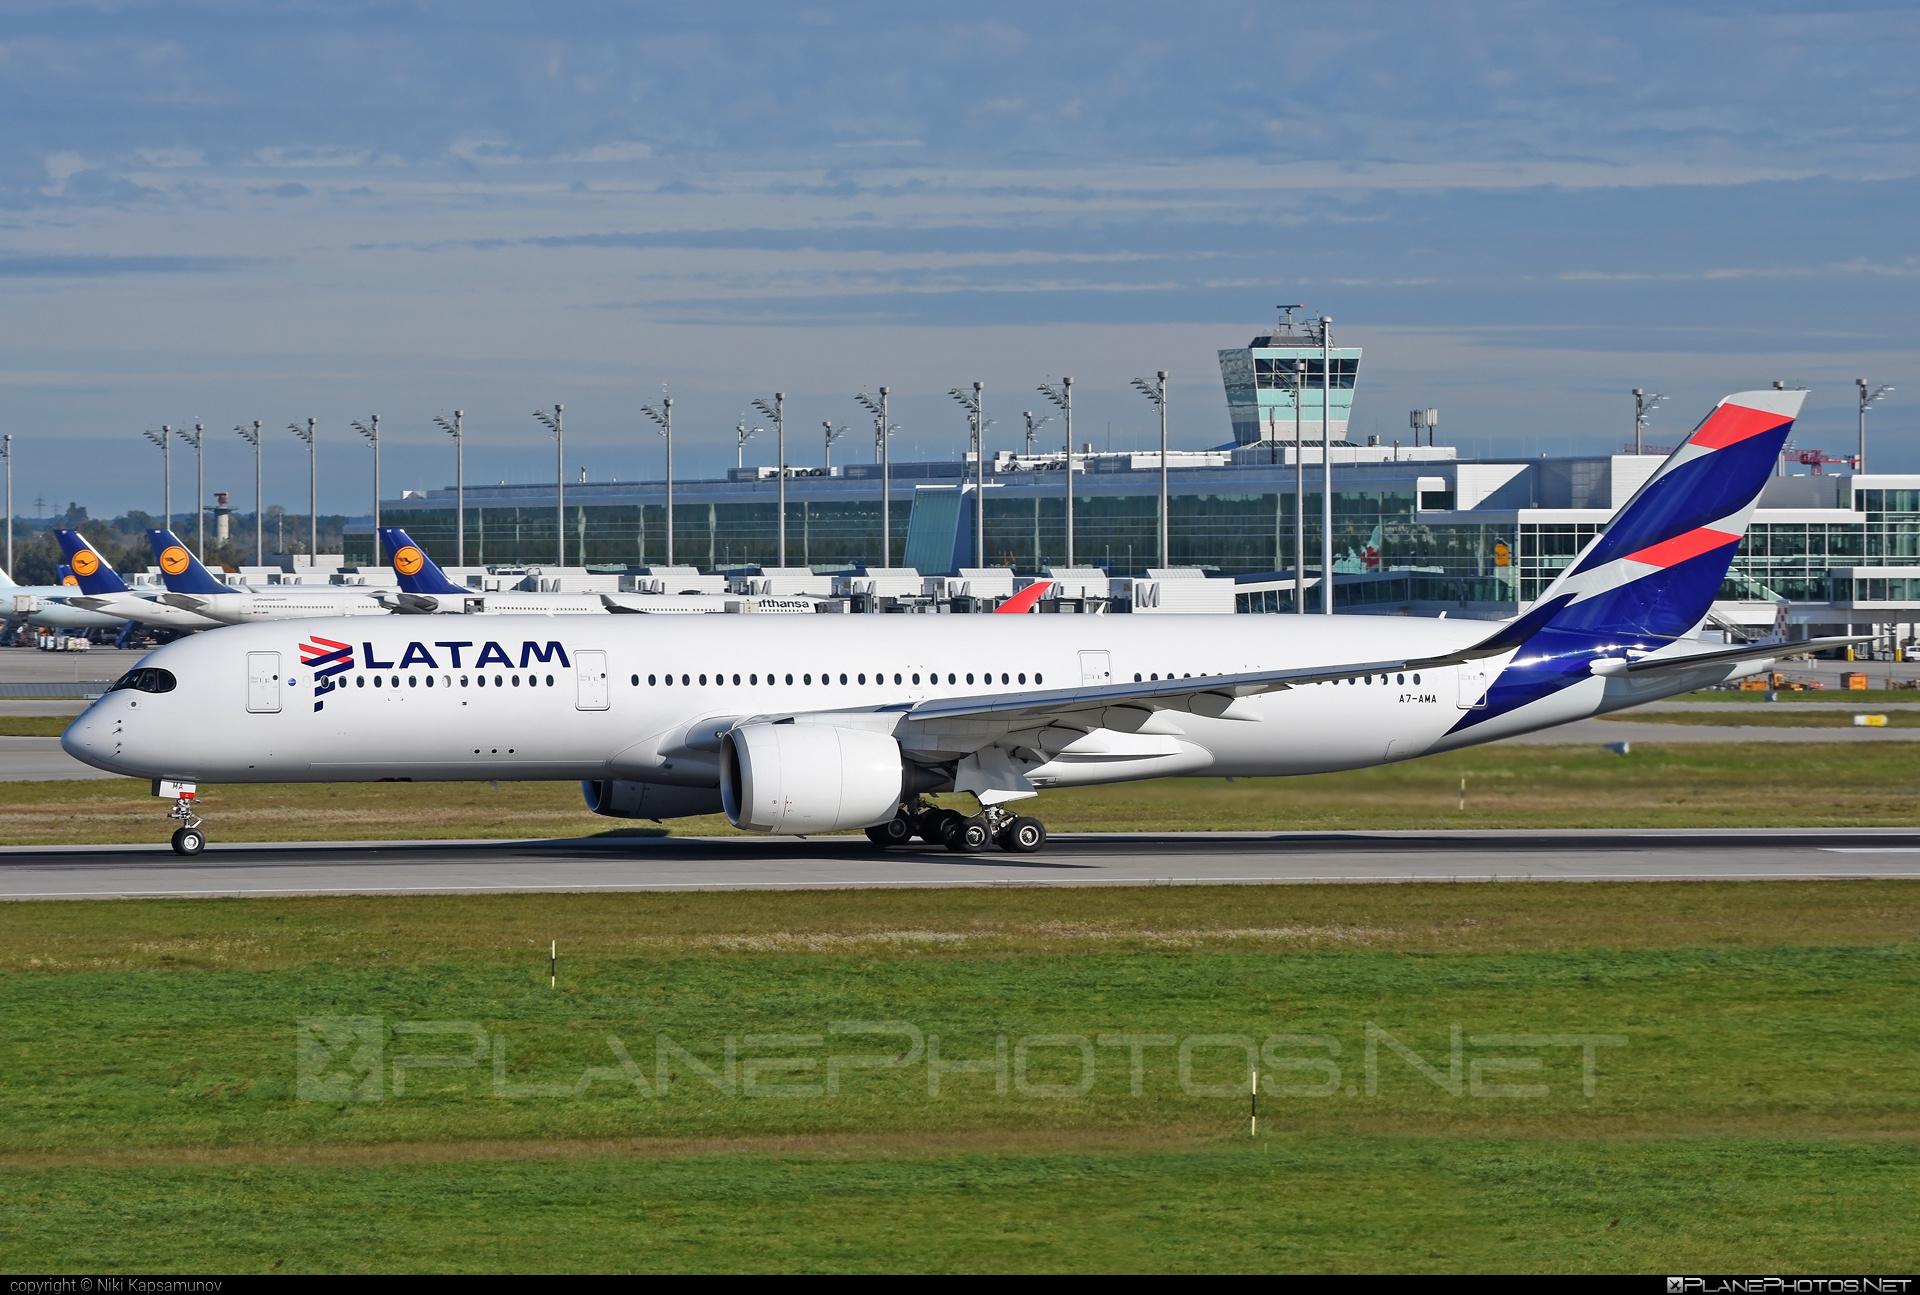 Airbus A350-941 - A7-AMA operated by Qatar Airways #a350 #a350family #airbus #airbus350 #latam #qatarairways #xwb